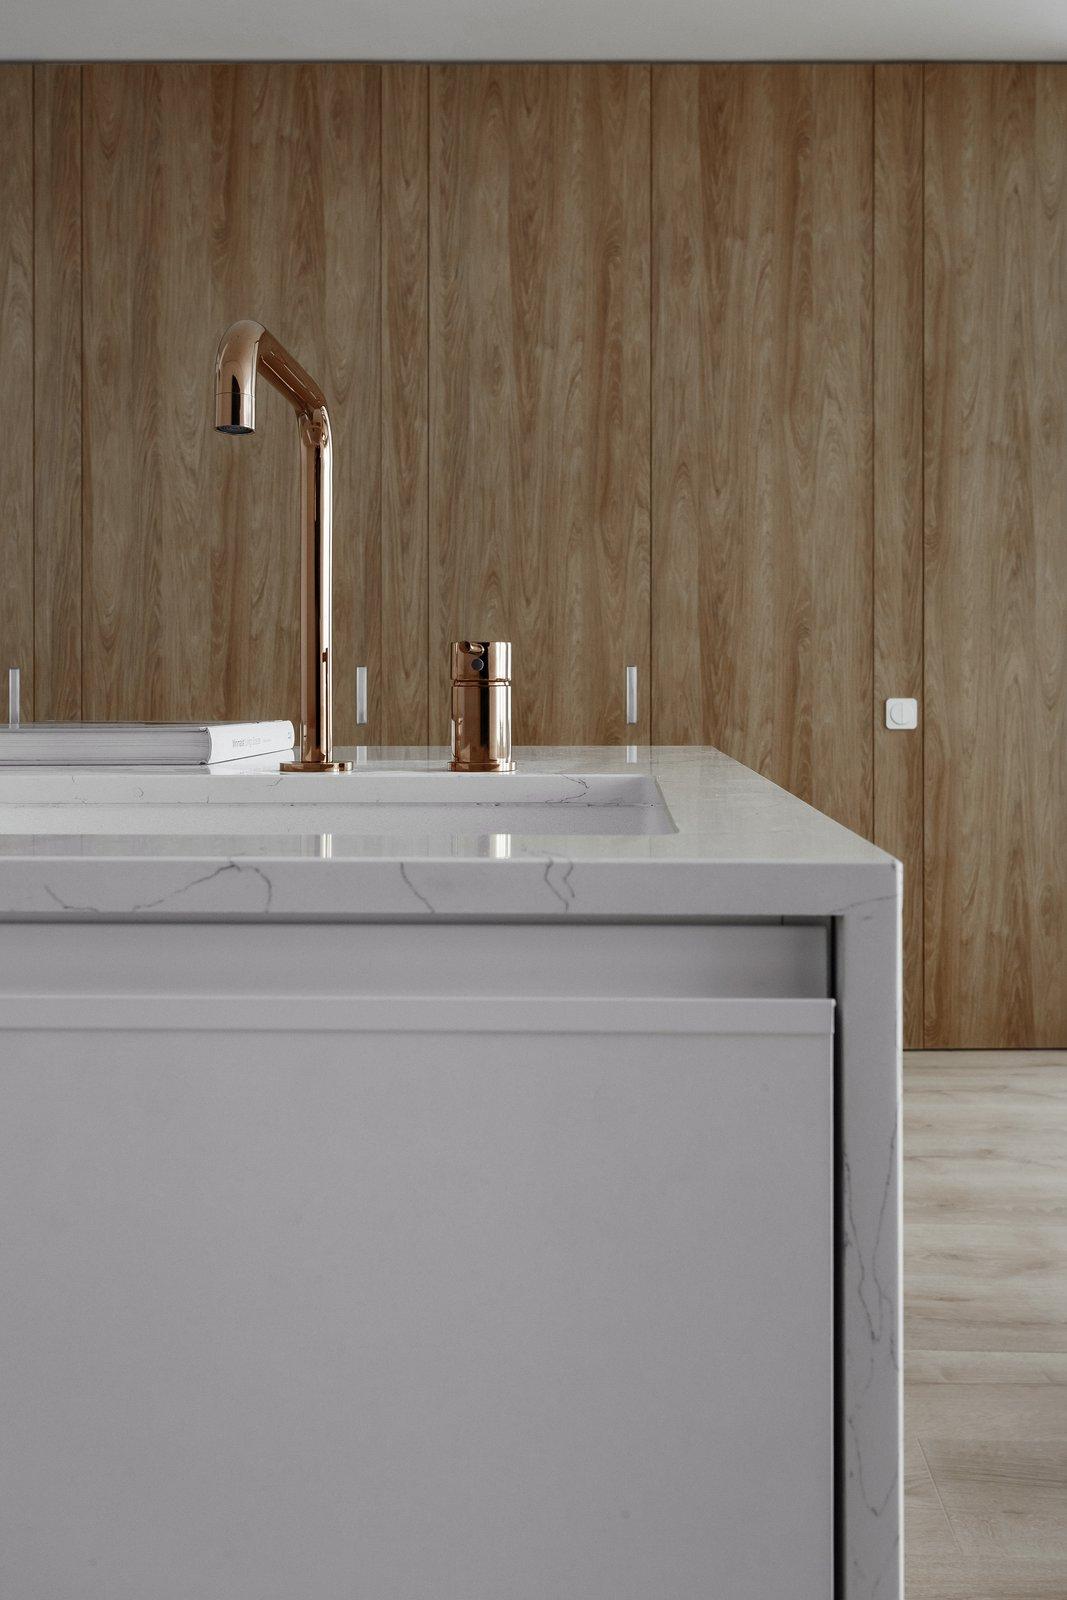 Kitchen, Quartzite Counter, Wood Cabinet, Drop In Sink, Ceiling Lighting, and Light Hardwood Floor  191 Apt.